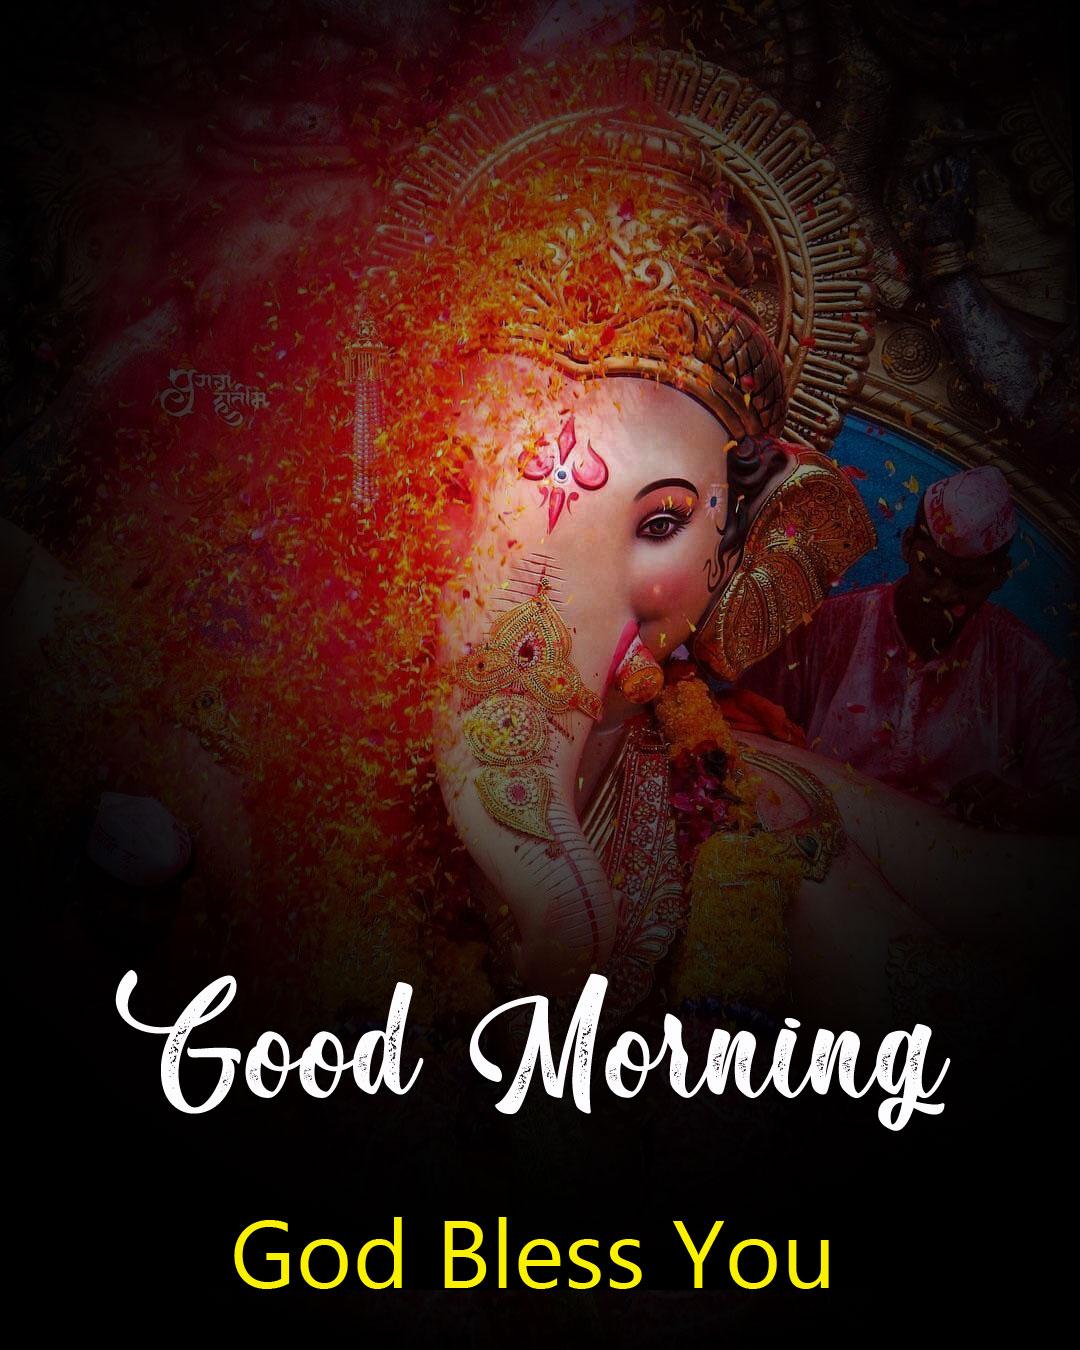 ganesha good morning images pics for download 3